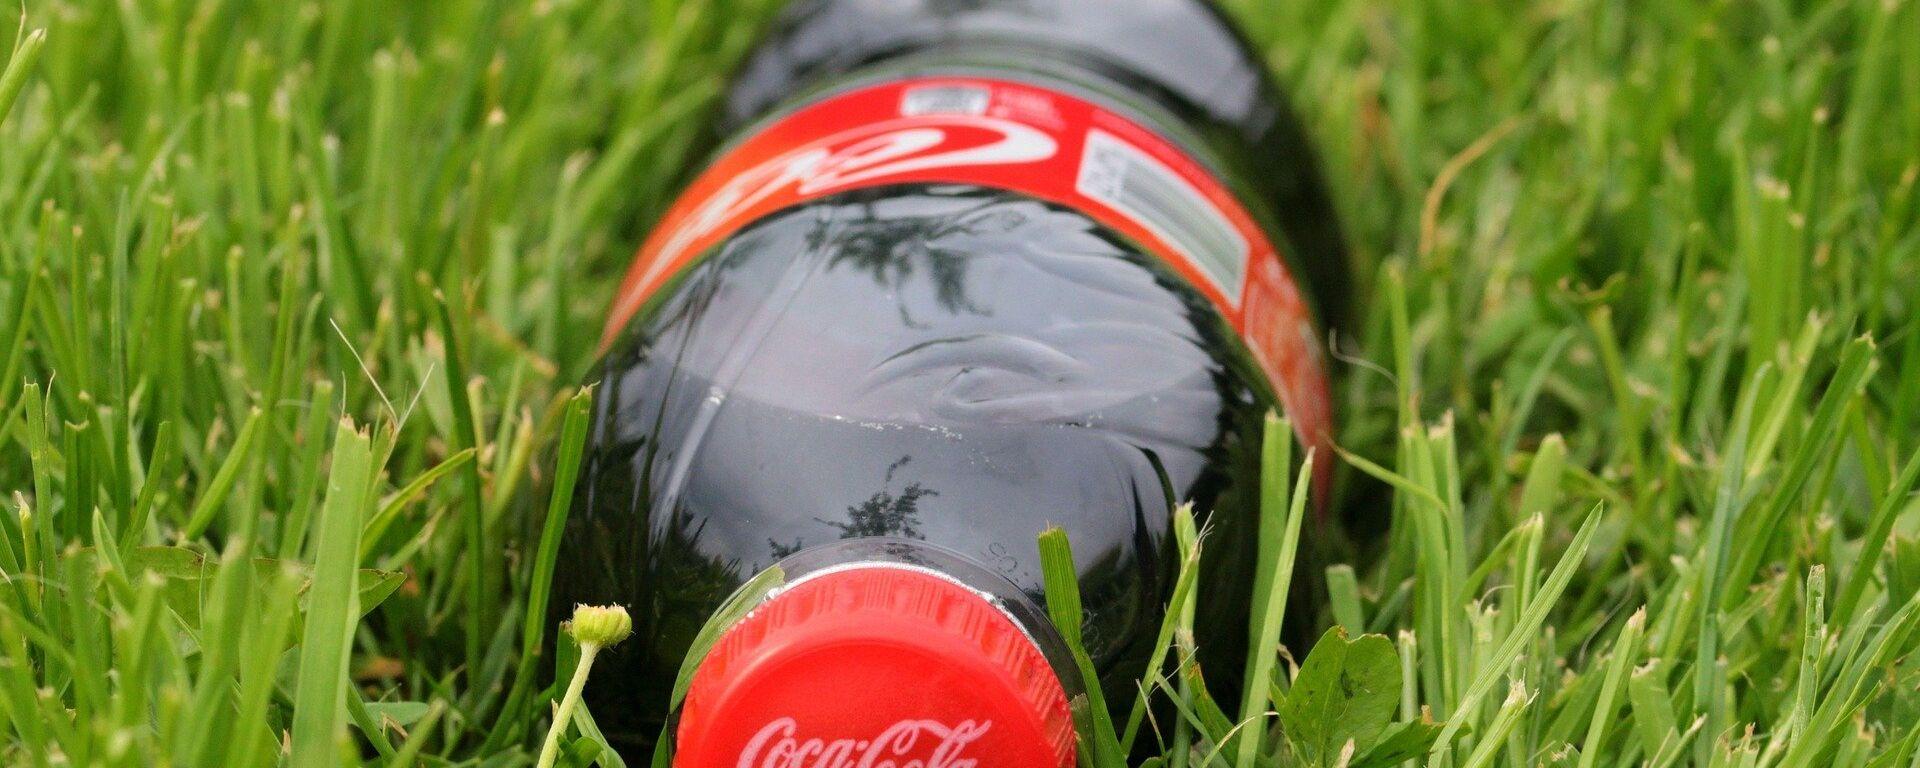 Una botela de Coca-Cola - Sputnik Mundo, 1920, 18.06.2021